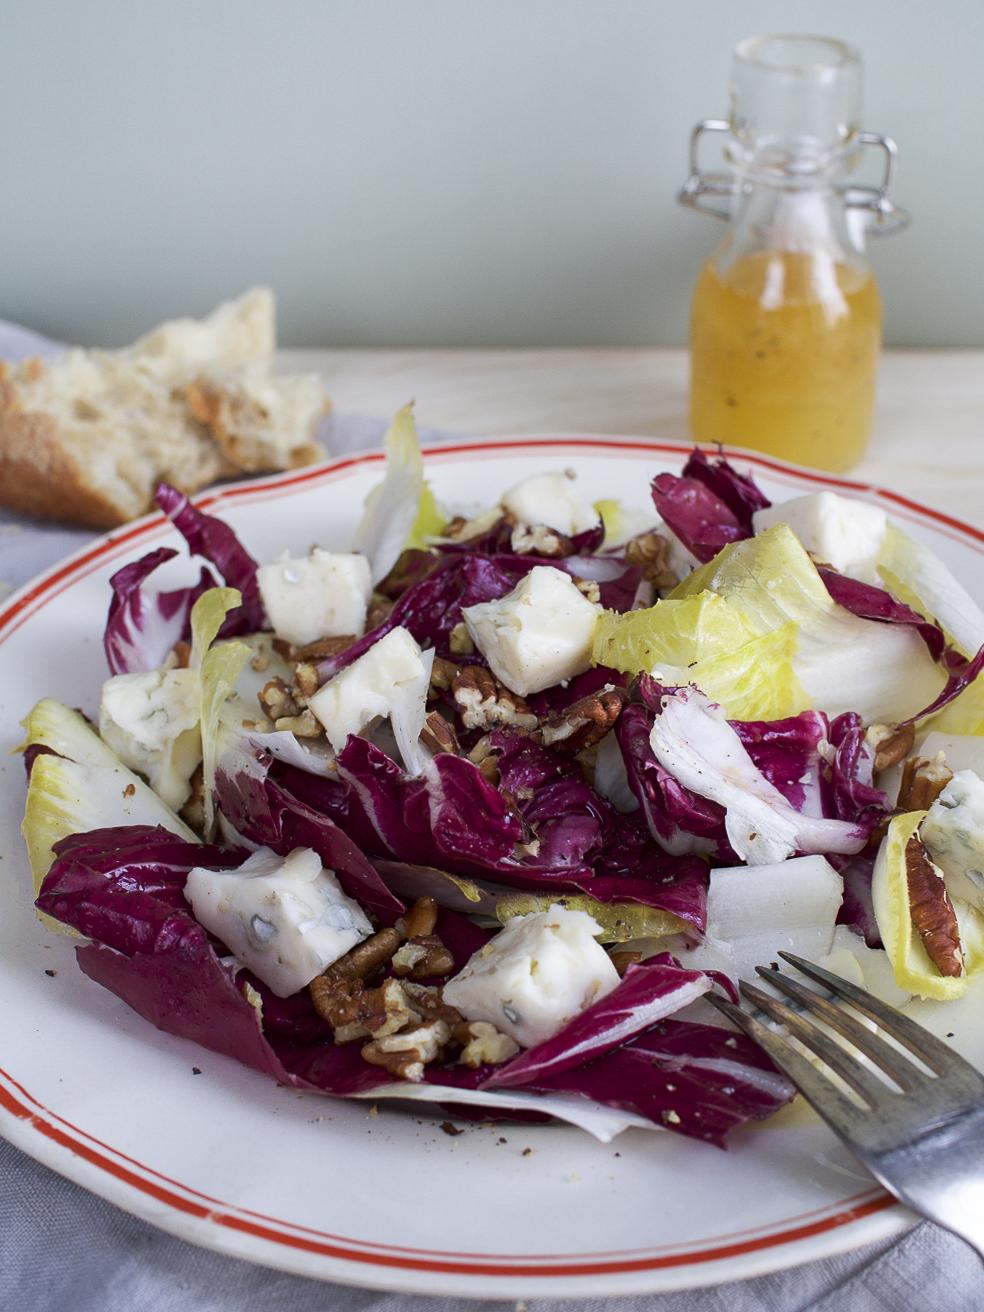 wintery salad made of endive and radiccio